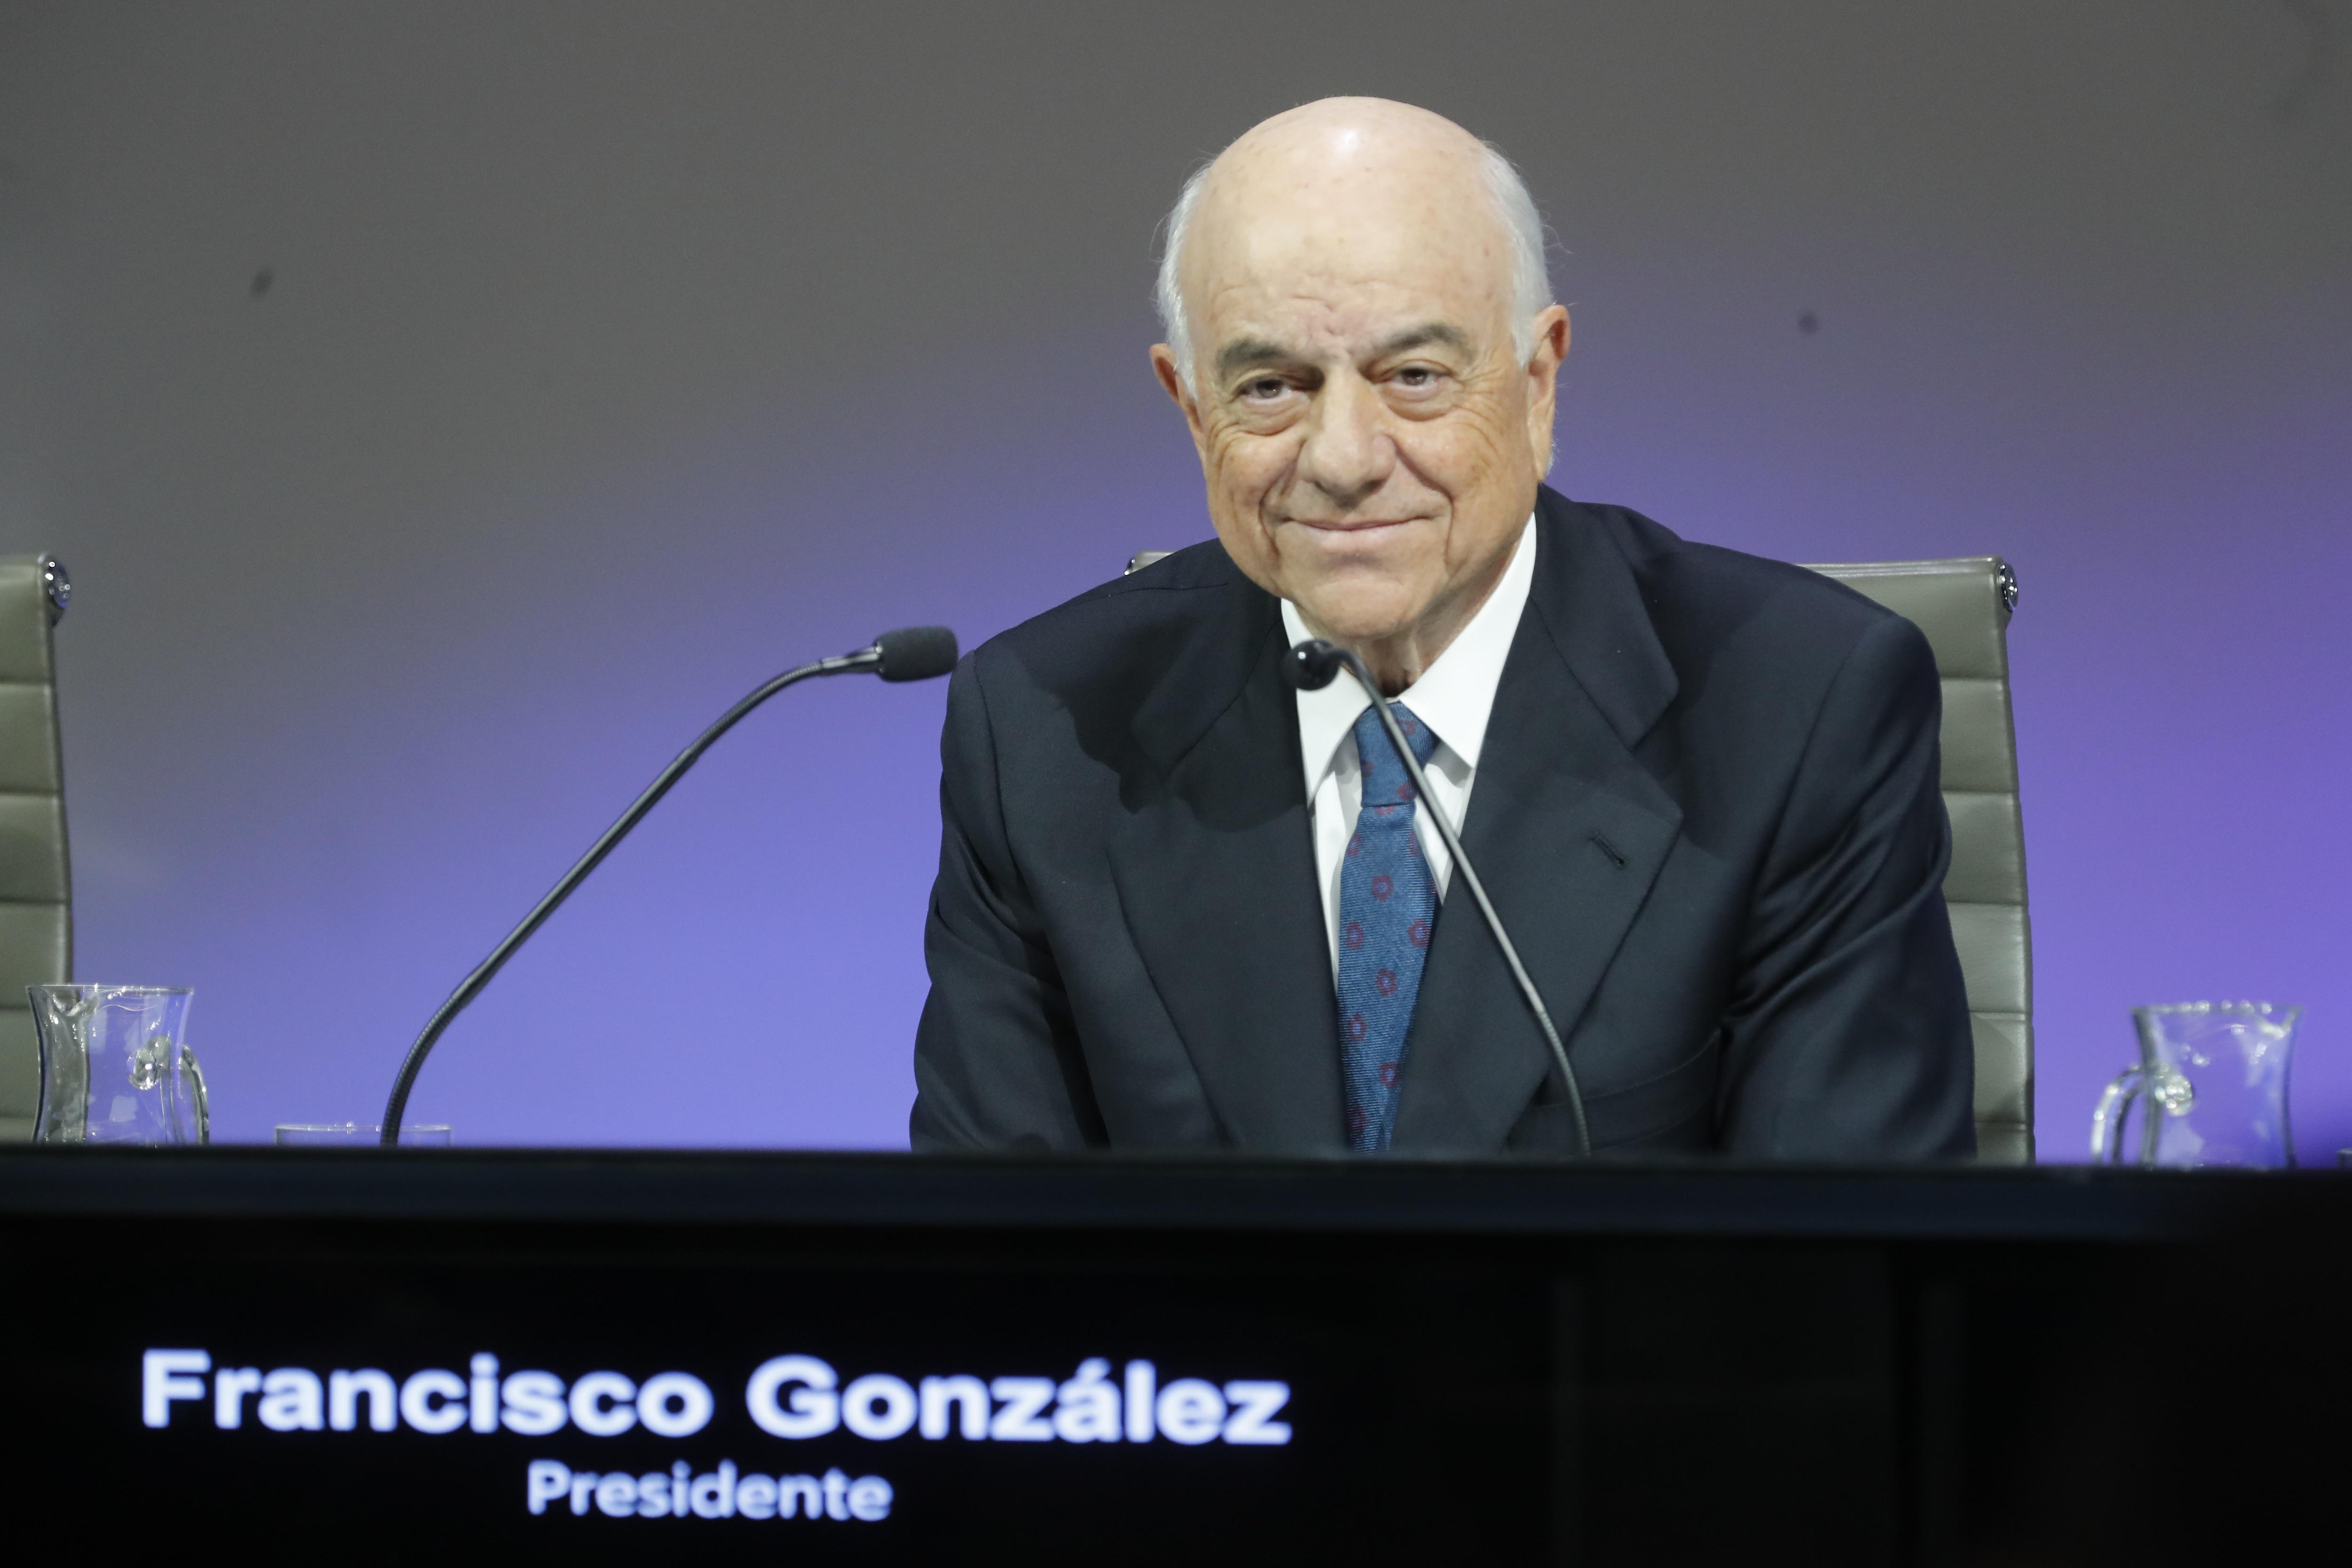 francisco-gonzalez-presidente-bbva-4t2016